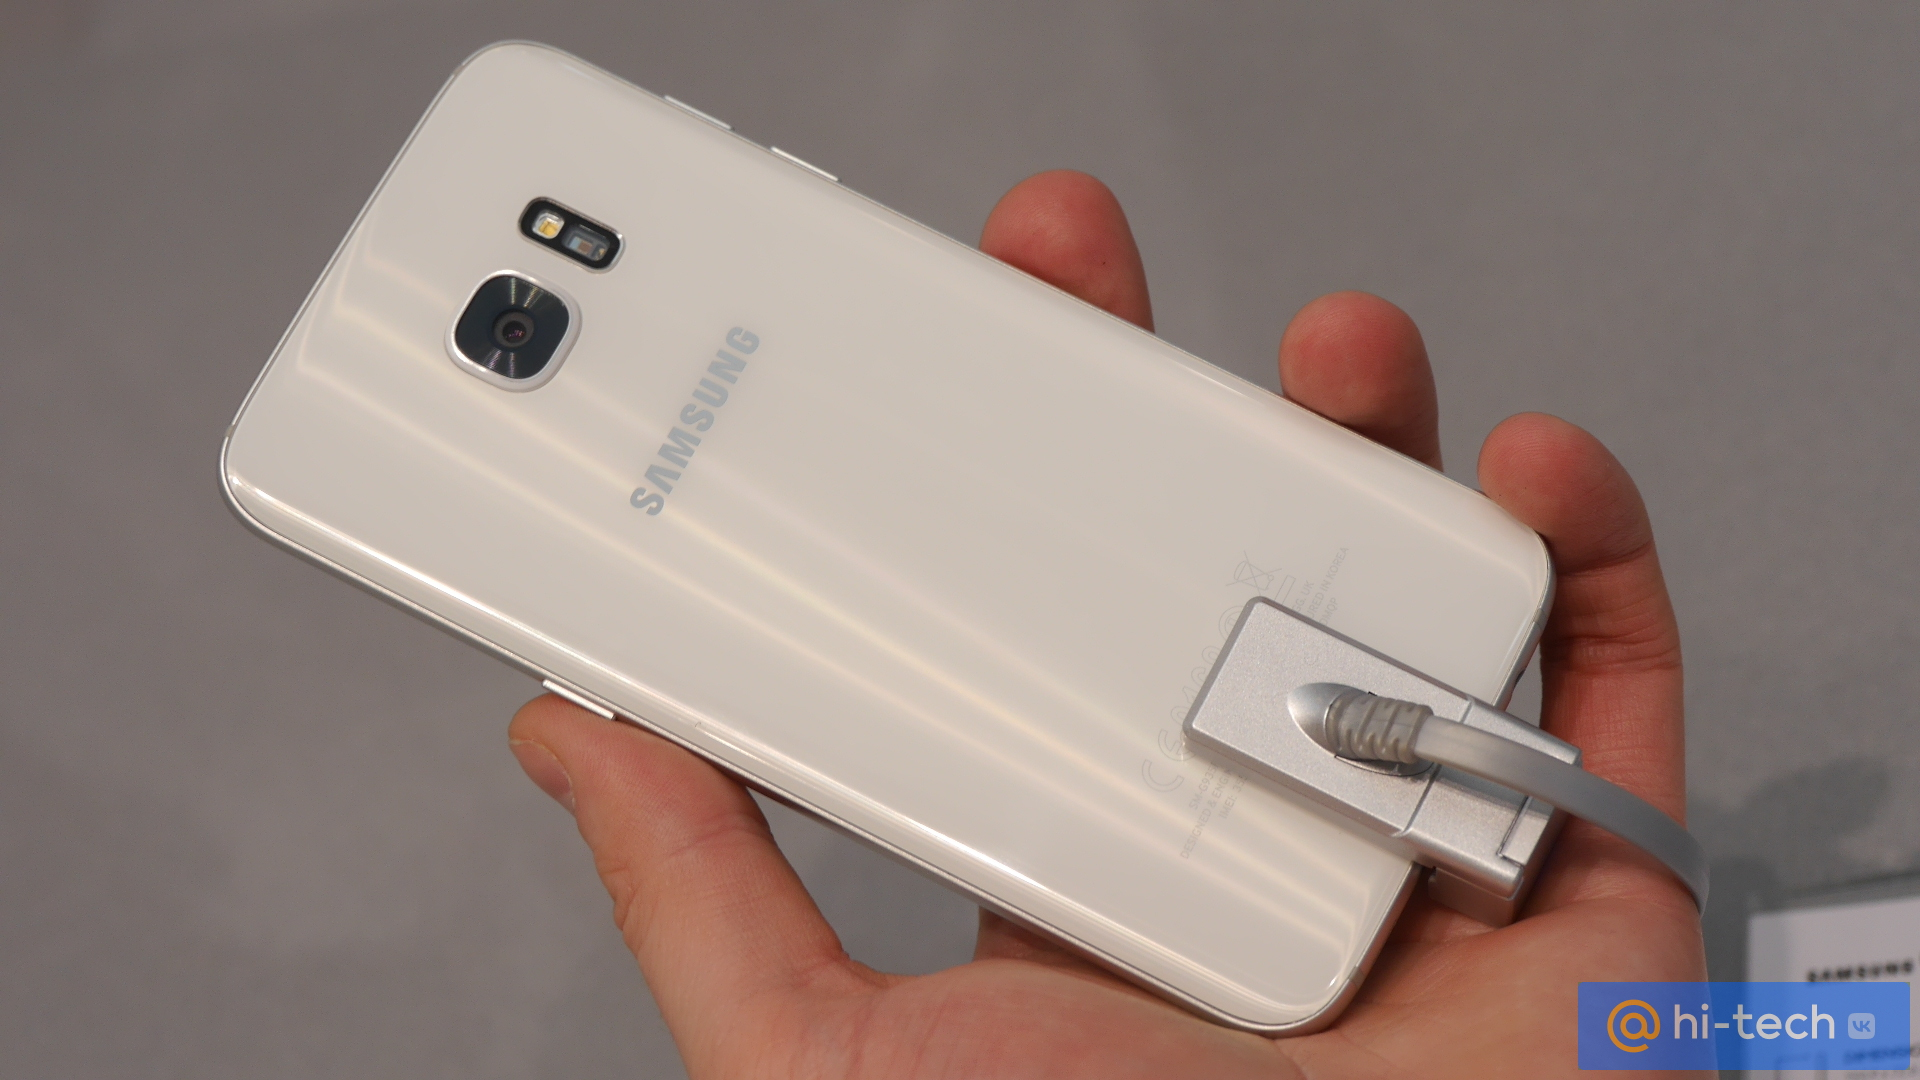 Samsung показал свои новые флагманы Galaxy S7, Galaxy S7 edge на выставке Mobile World Congress (MWC) 2016